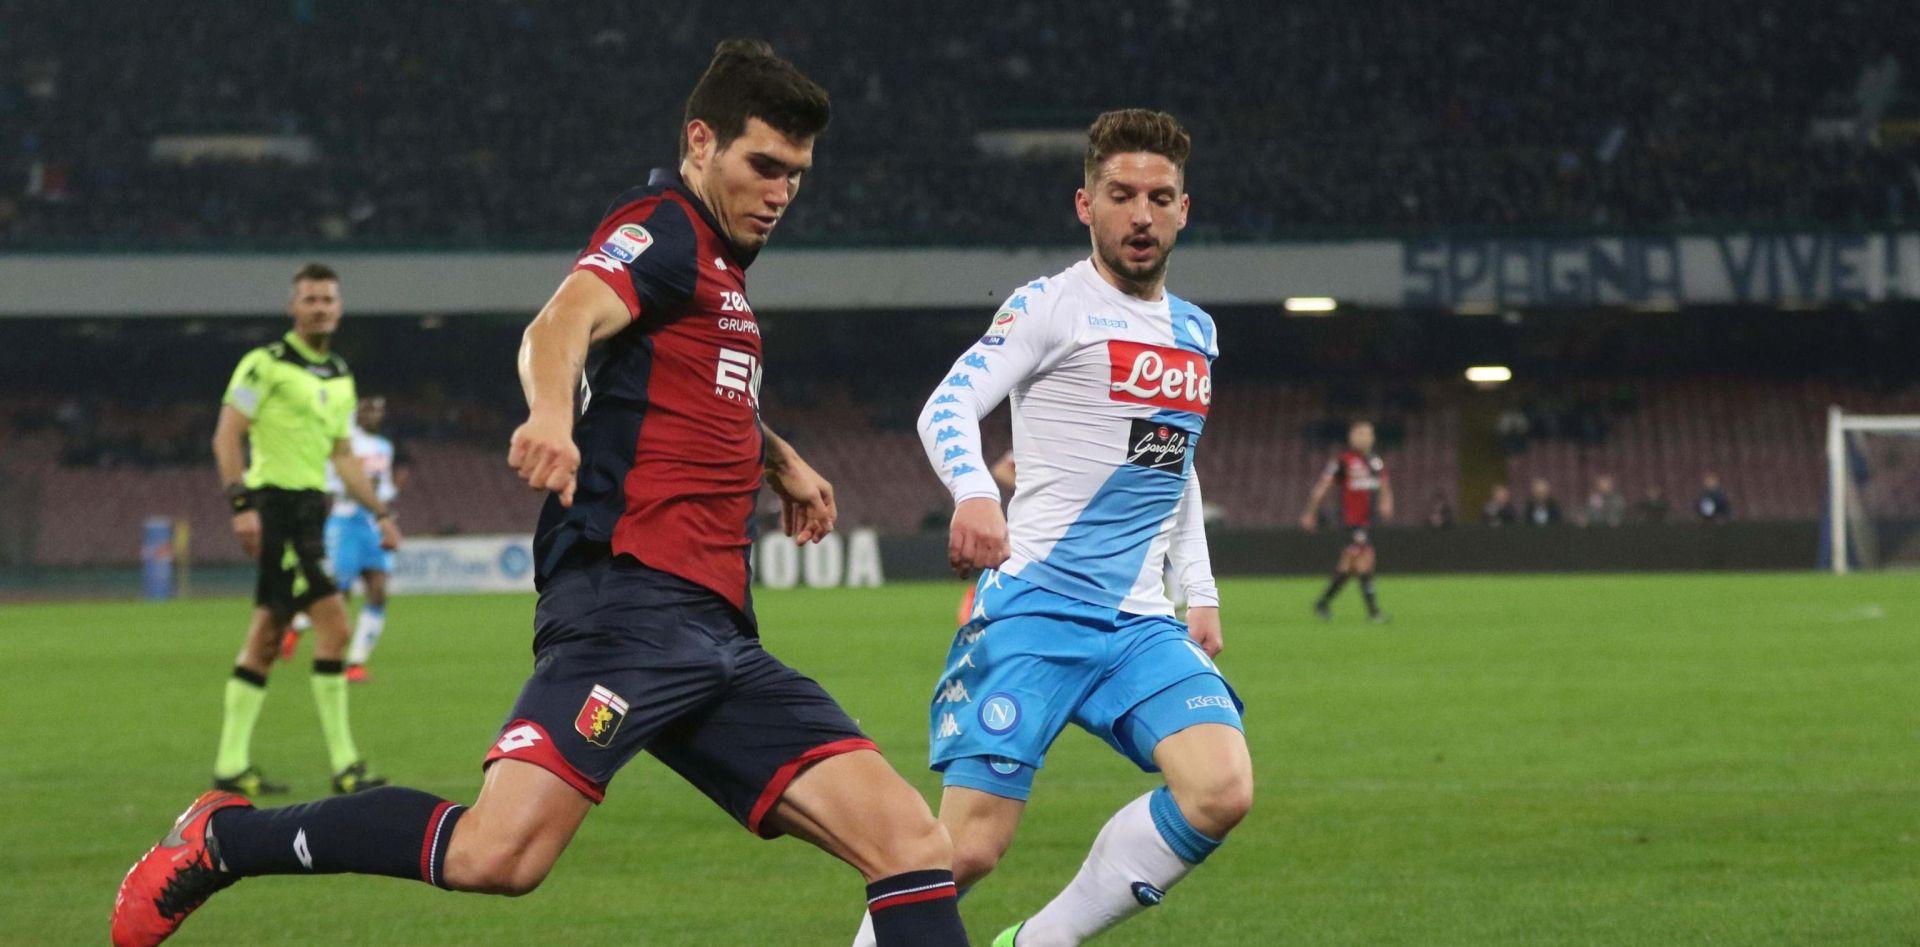 SERIE A Napoli bolji od Genoe, Rog dobio 15 minuta